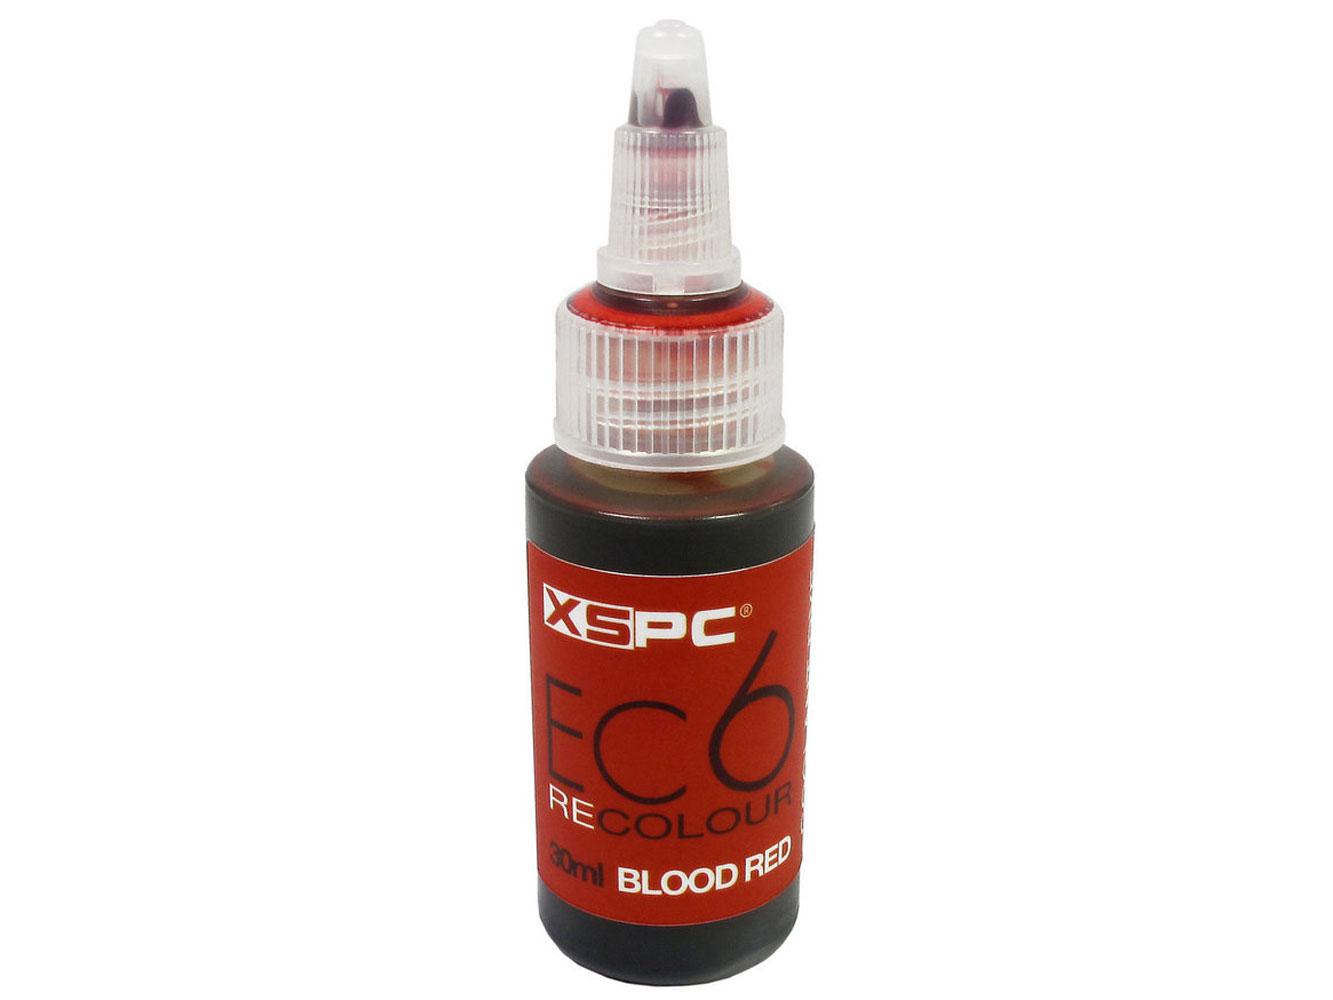 EC6 ReColour Dye - Blood Red — XSPC - Performance PC